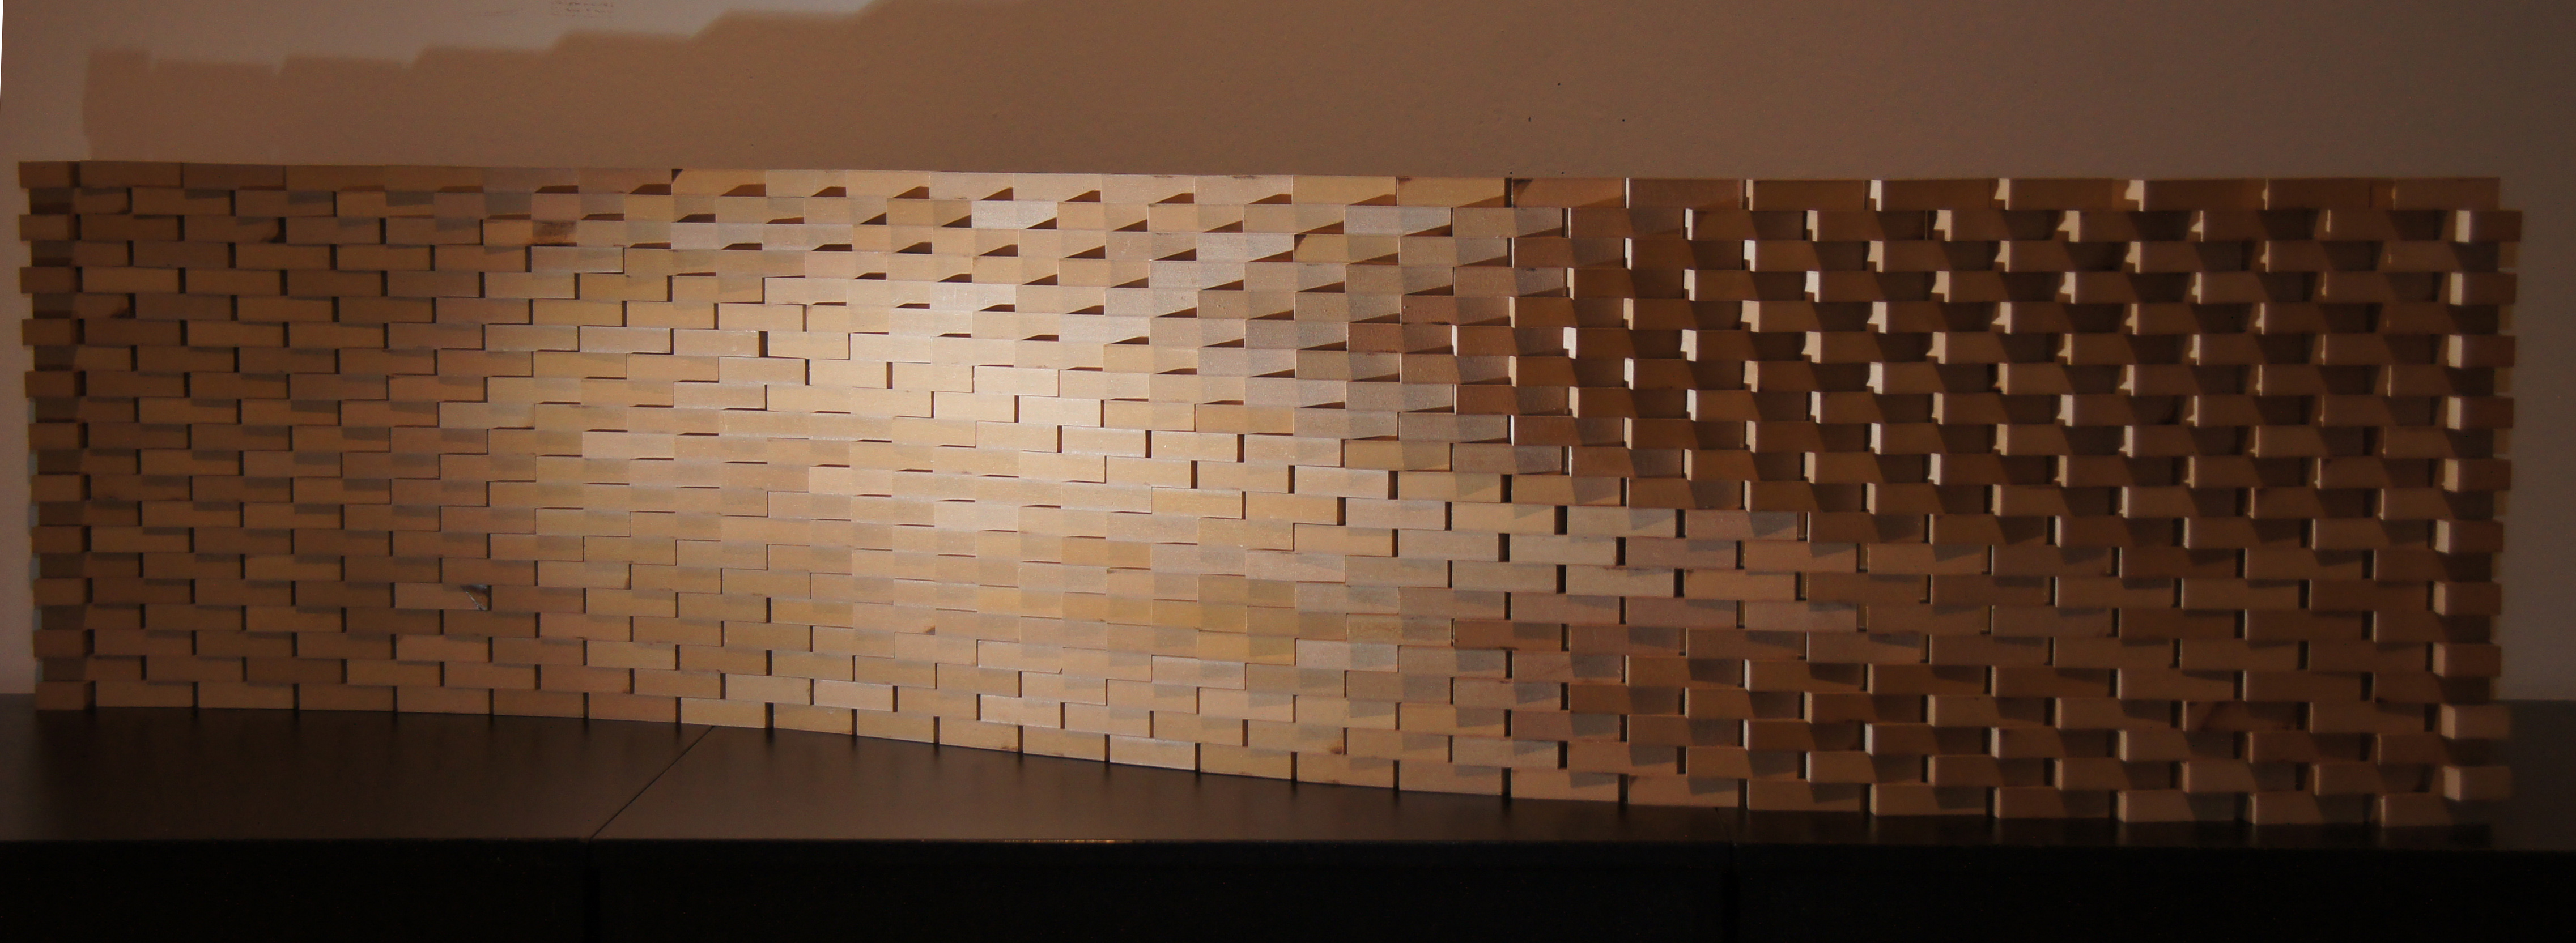 Digitally fabricated brick wall DIGITAL DESIGN CENTER